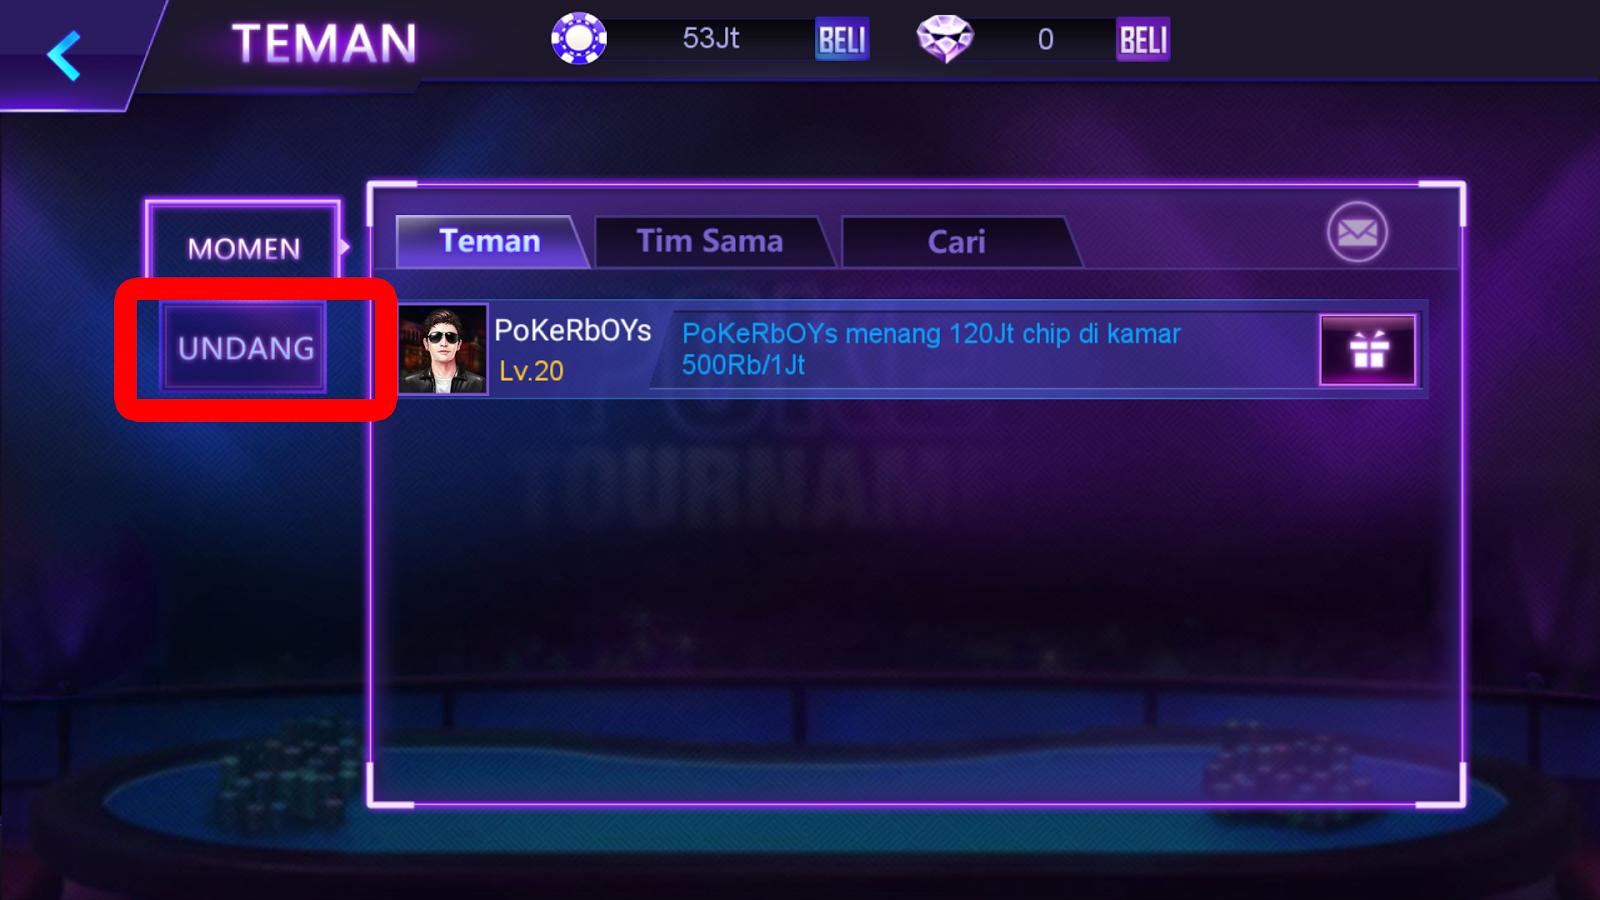 QQ87 @Gamez: Mau....Bermain Game Poker Sambil Dapat Pulsa ...